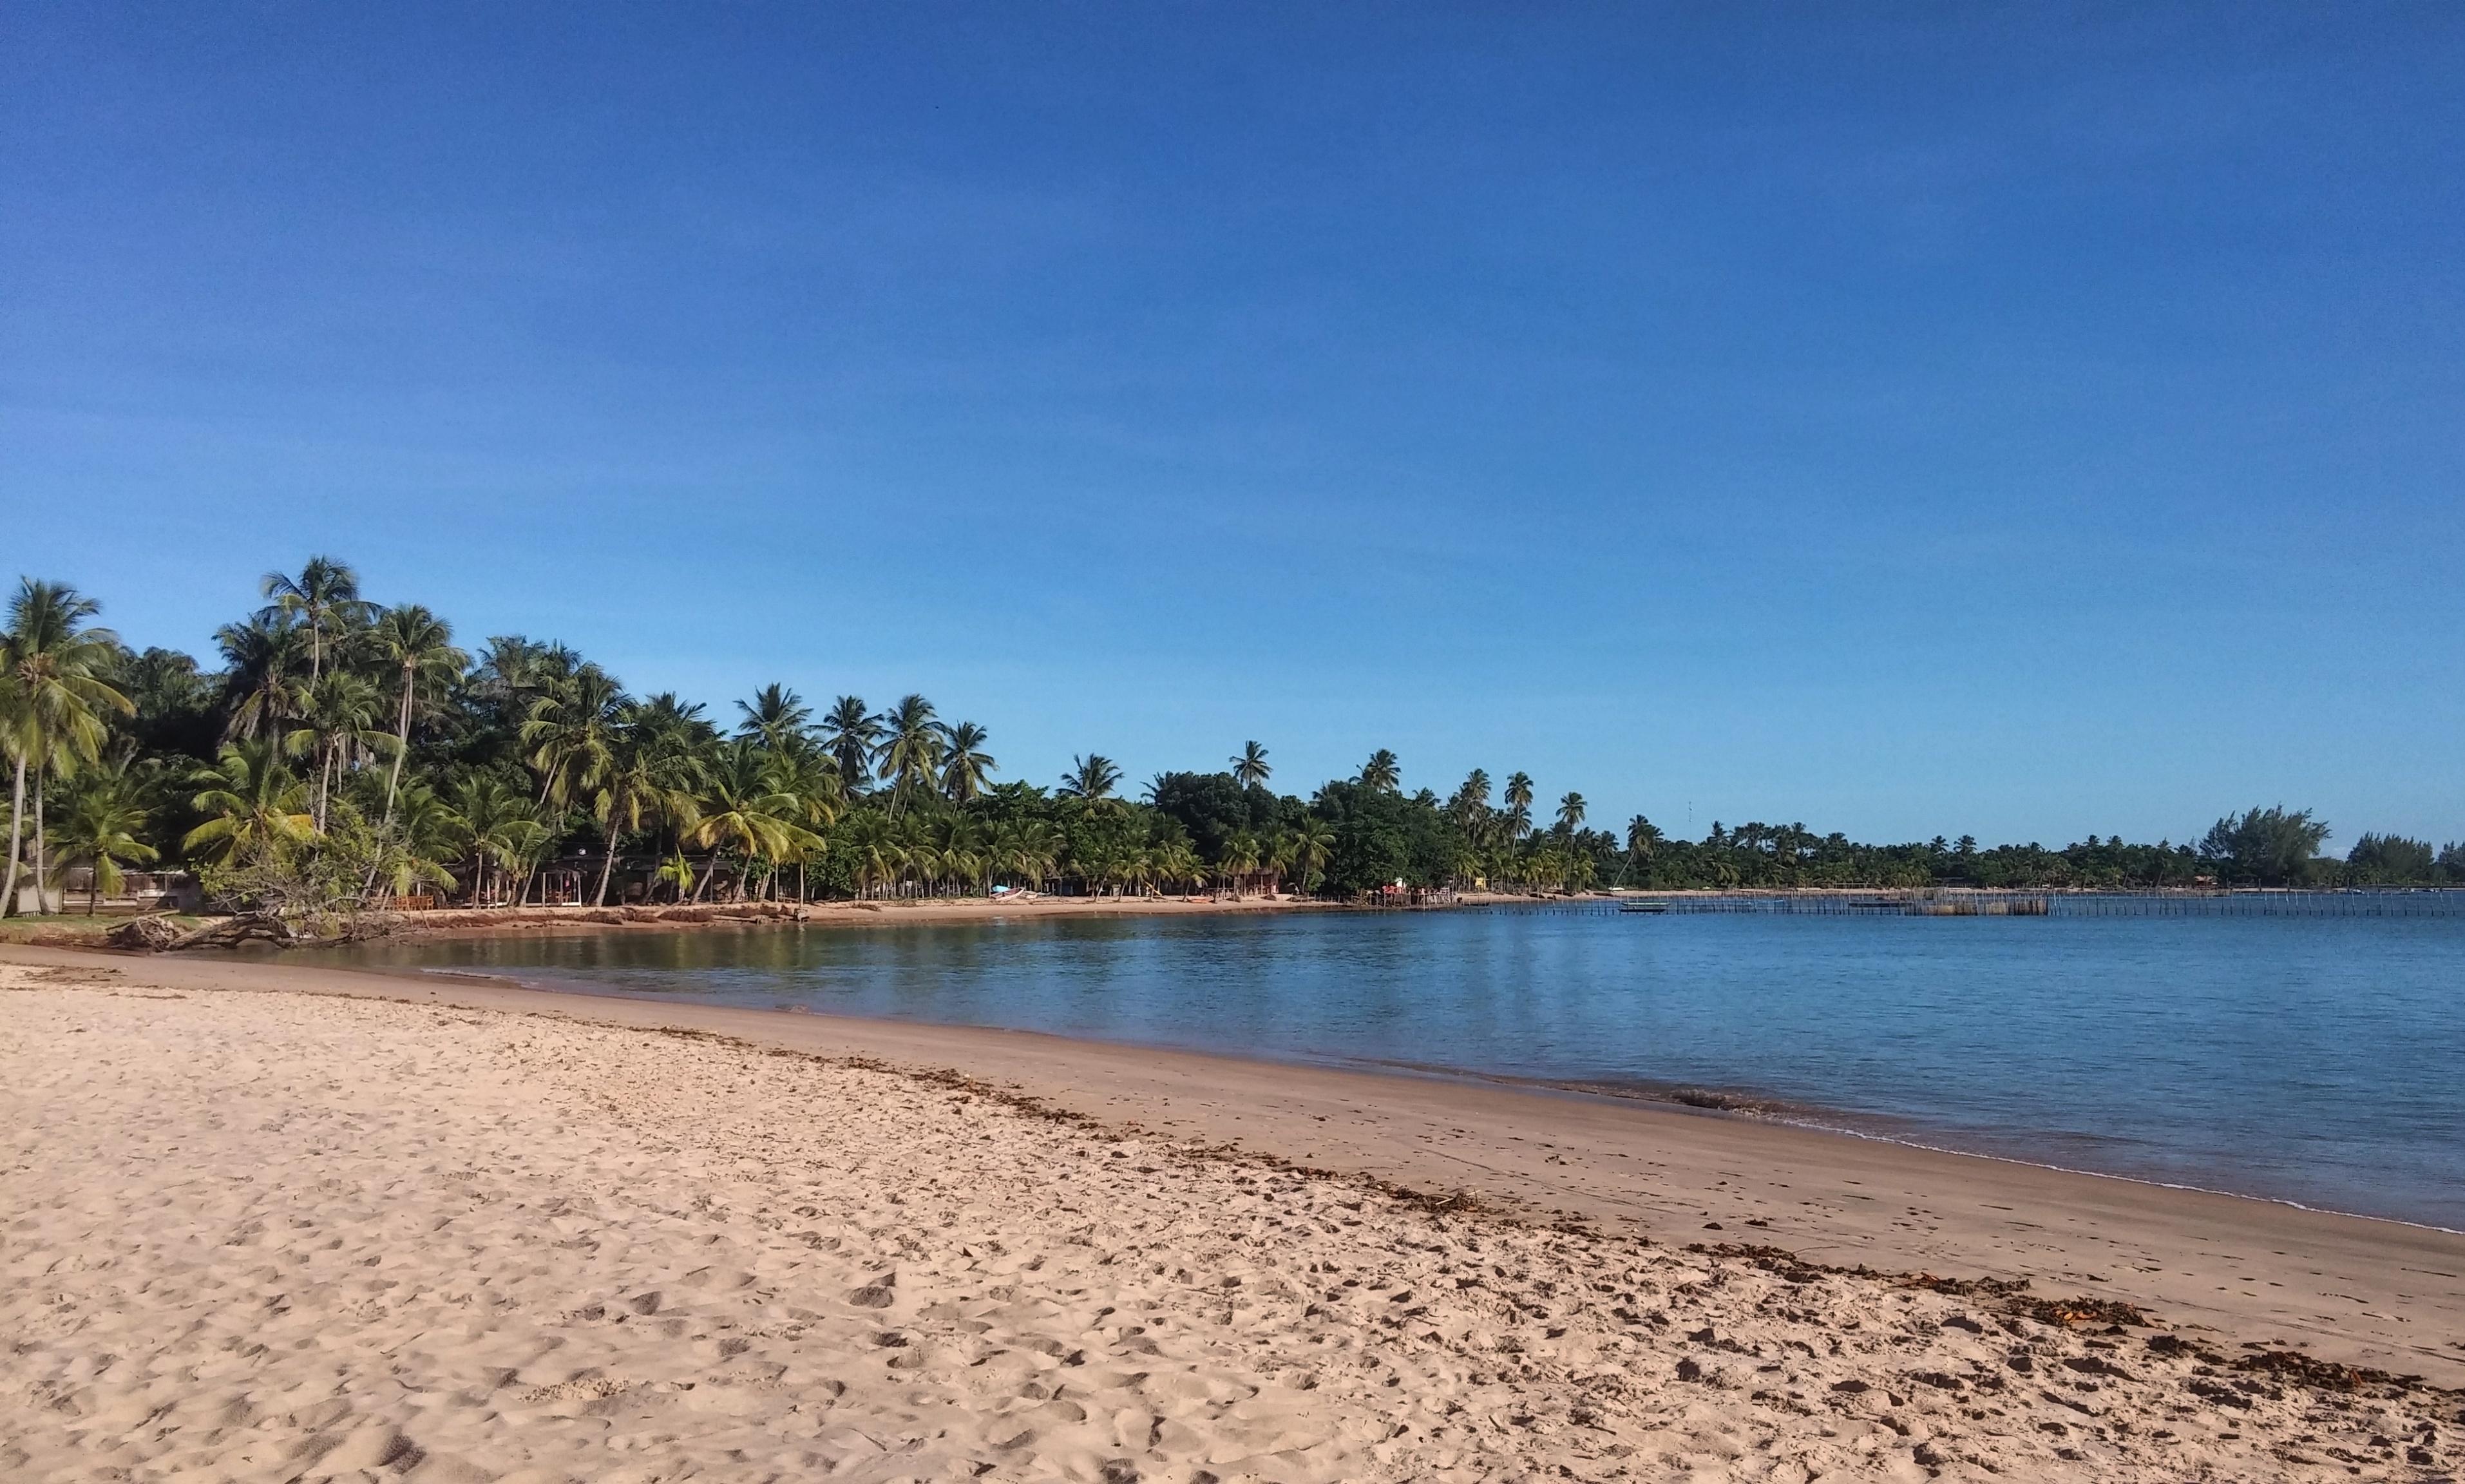 Praia Ponta do Mutá, Barra Grande, Península de Maraú - BA, by Luciana de Paula, 2016